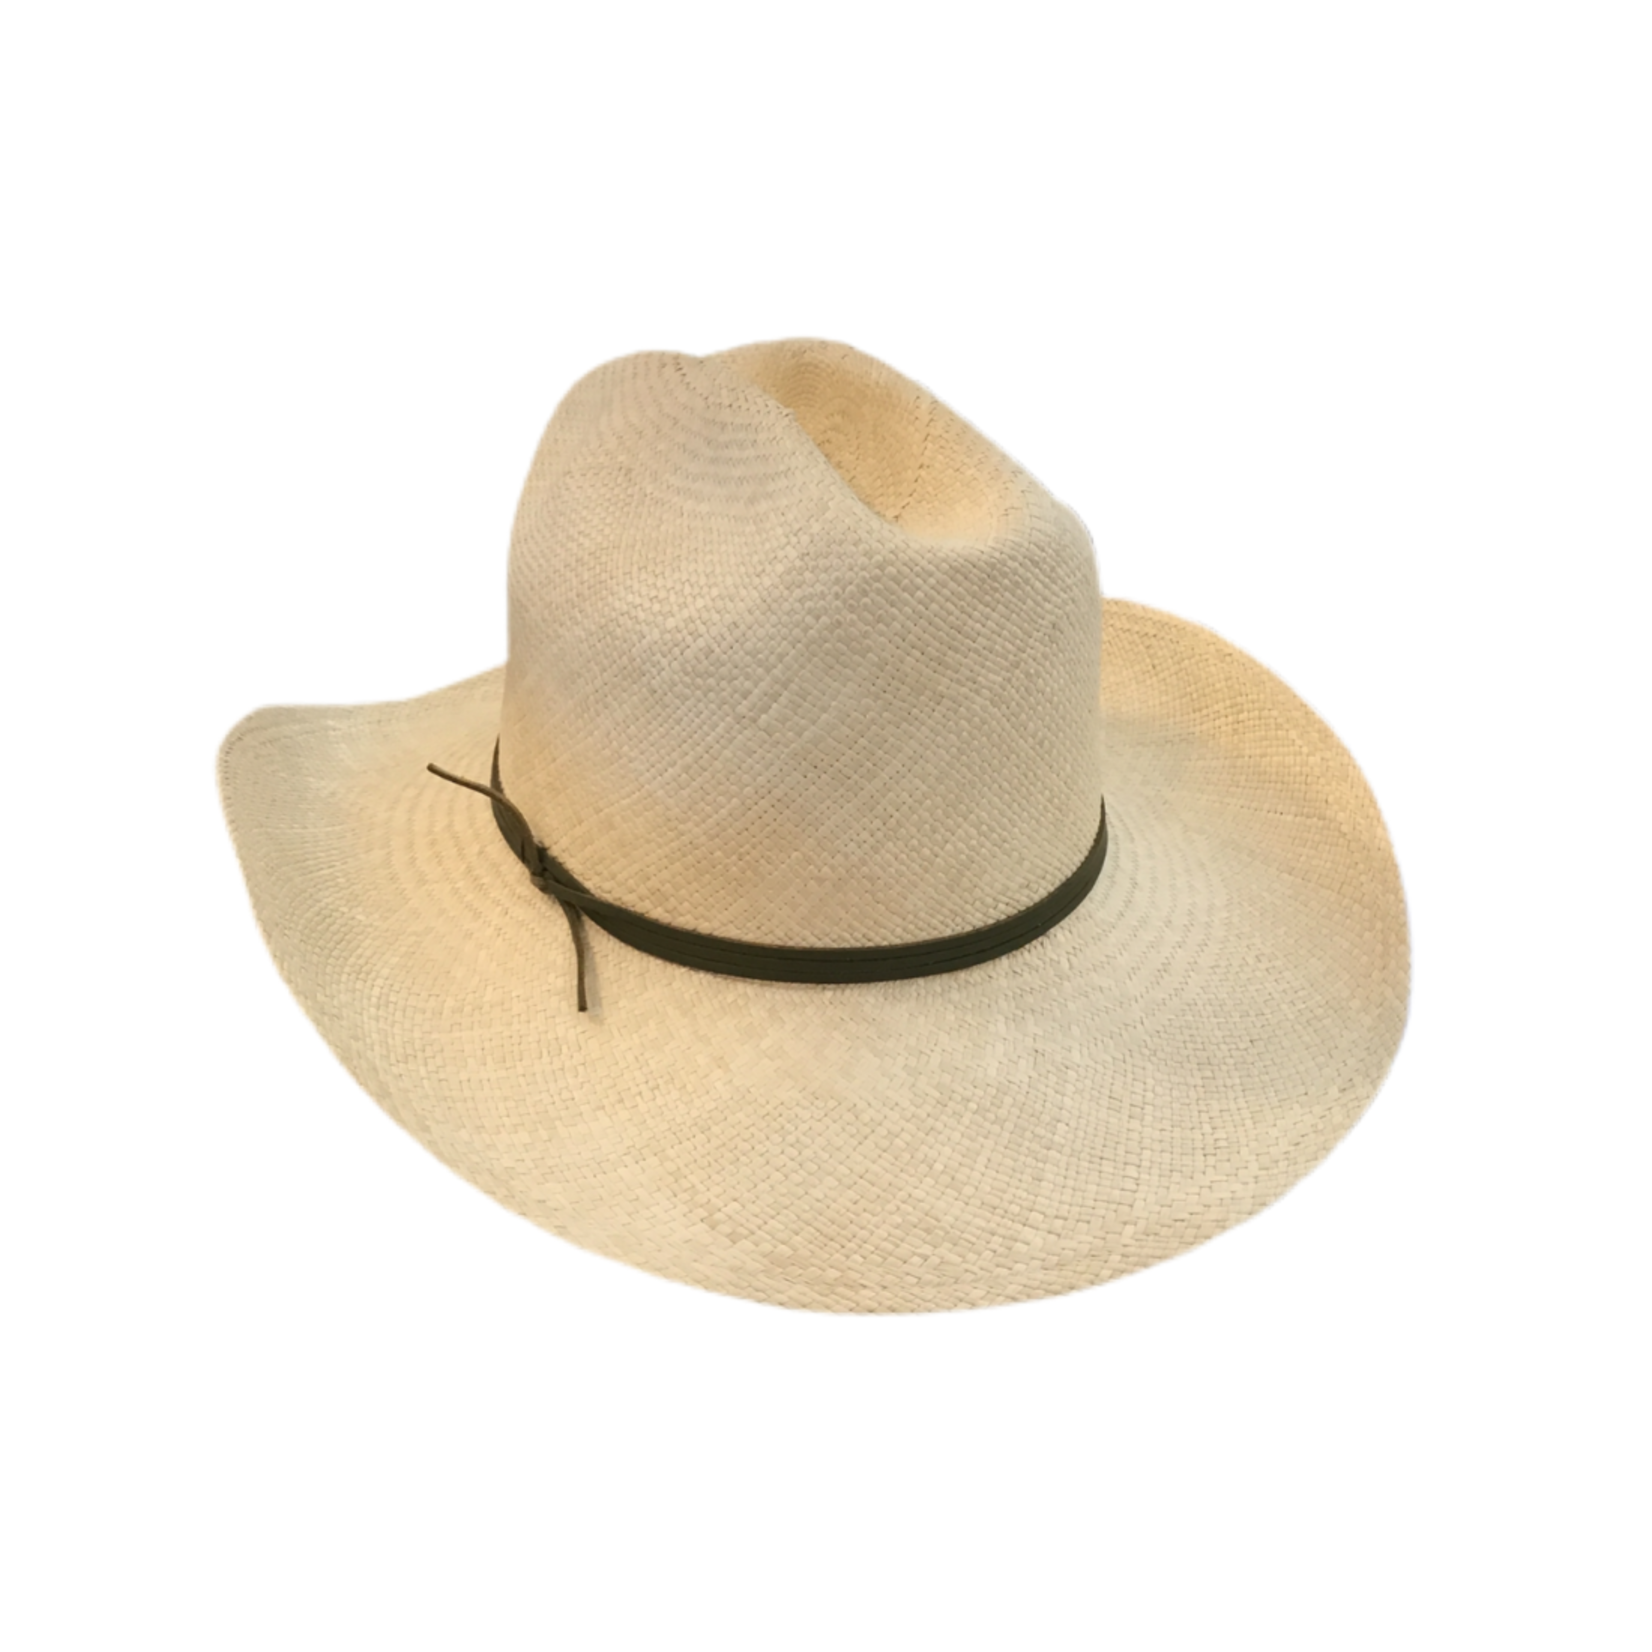 Modern Monarchie Montana Straw Hat